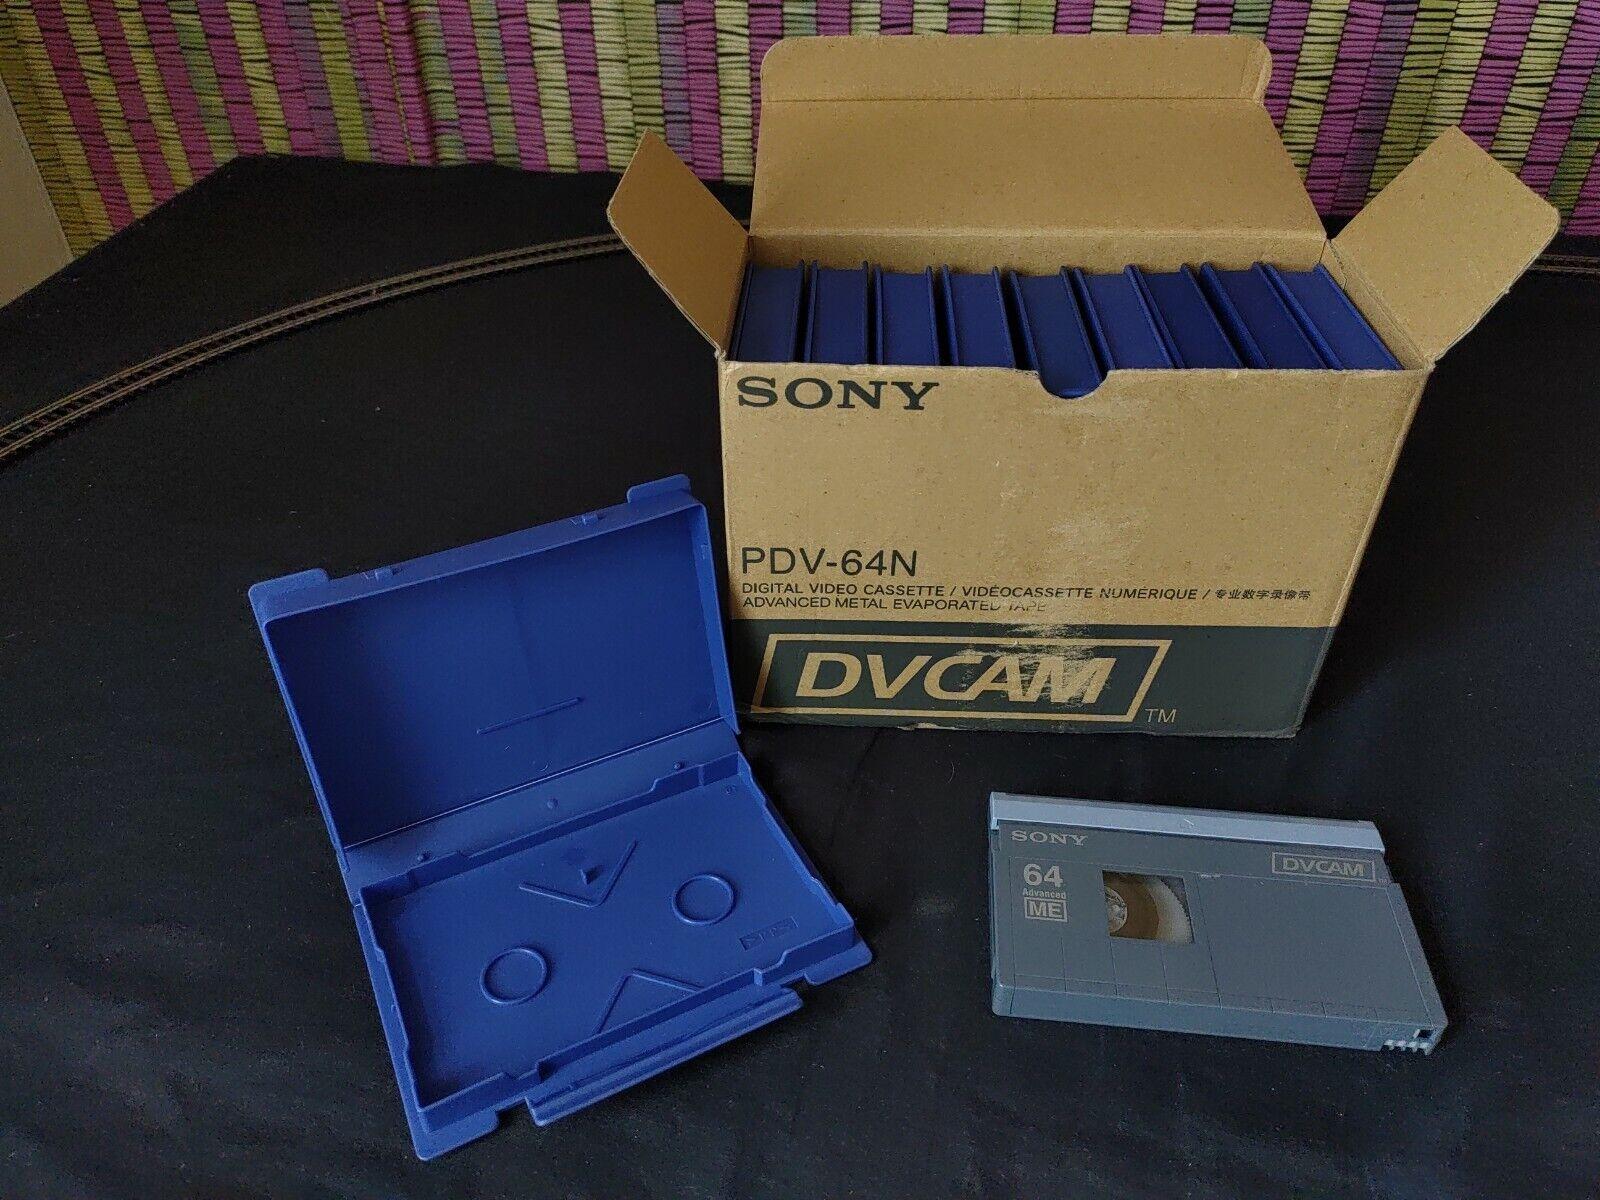 Sony DVCAM PDV-64N Tapes (Pack of 10)